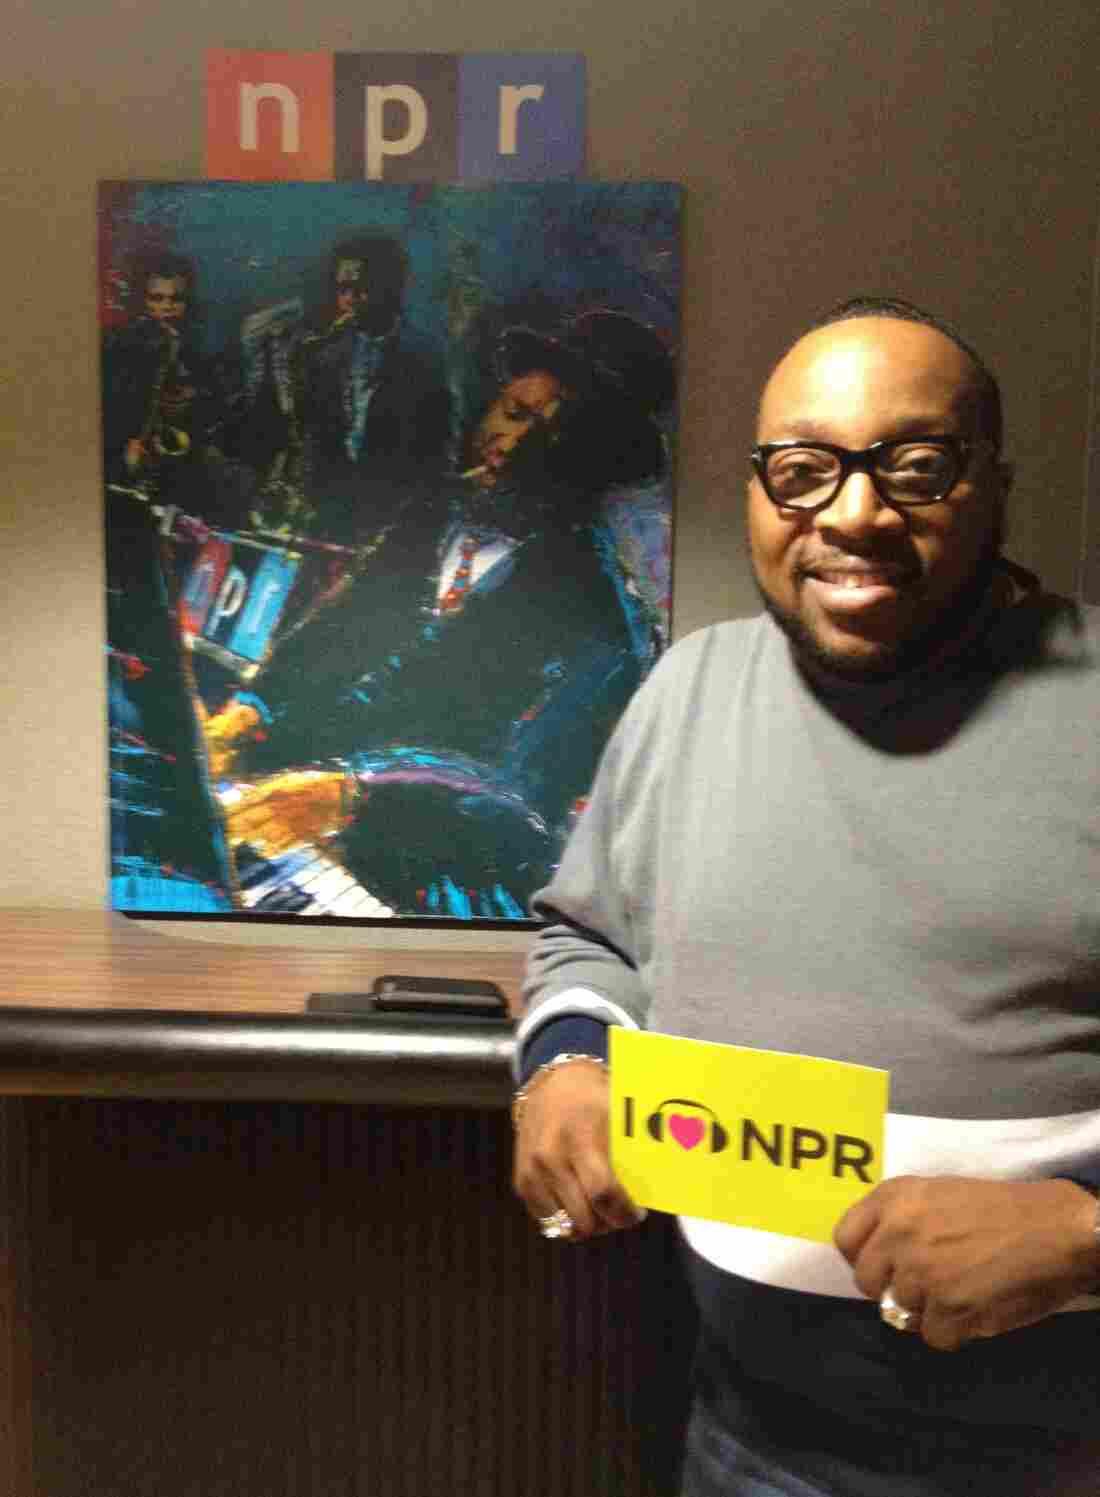 Marvin Sapp at NPR HQ in DC